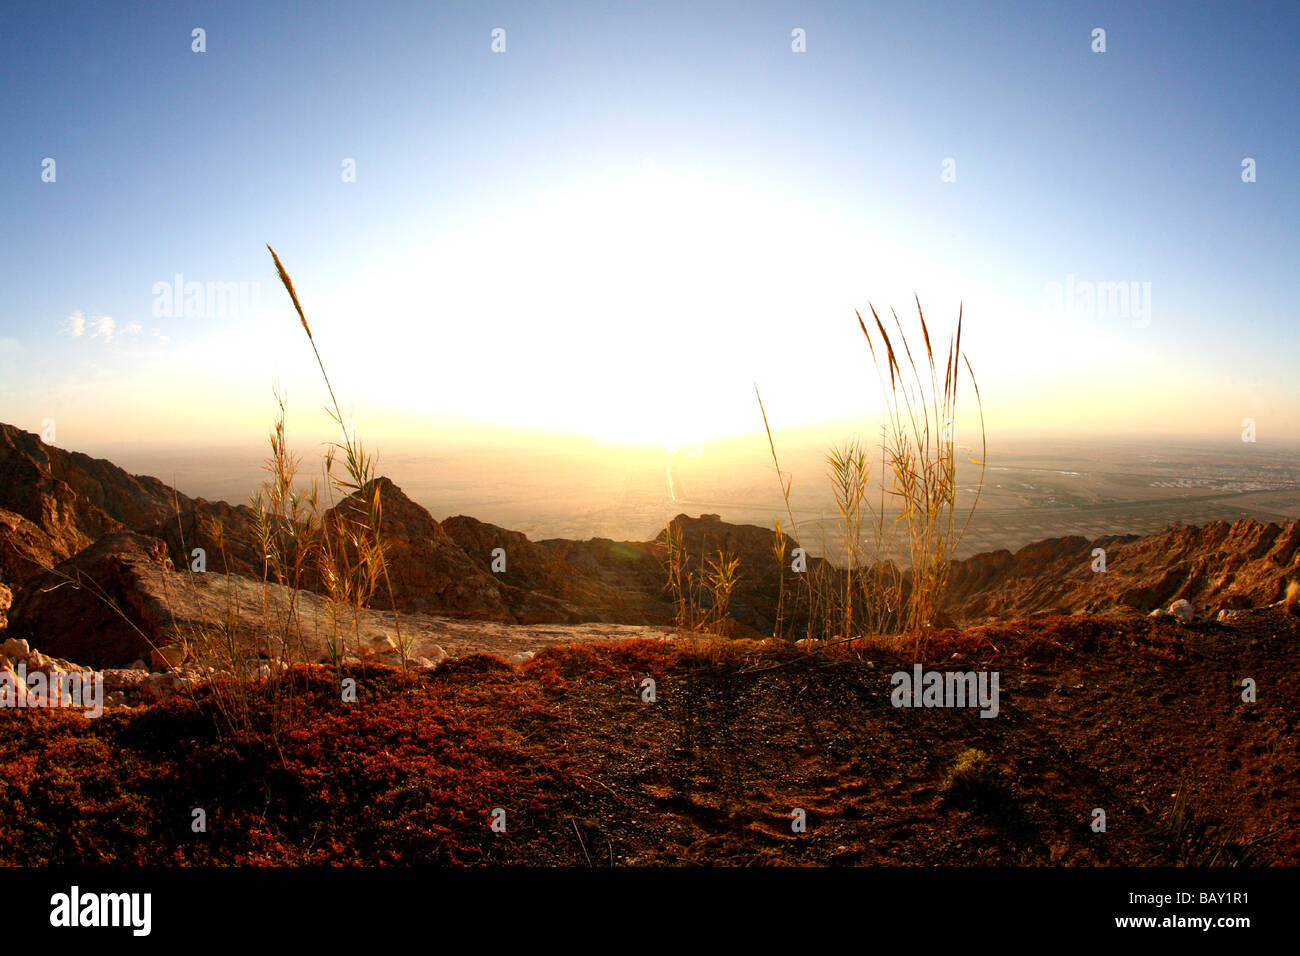 View from Jebel Hafeet, Al Ain, Abu Dhabi, United Arab Emirates, UAE - Stock Image